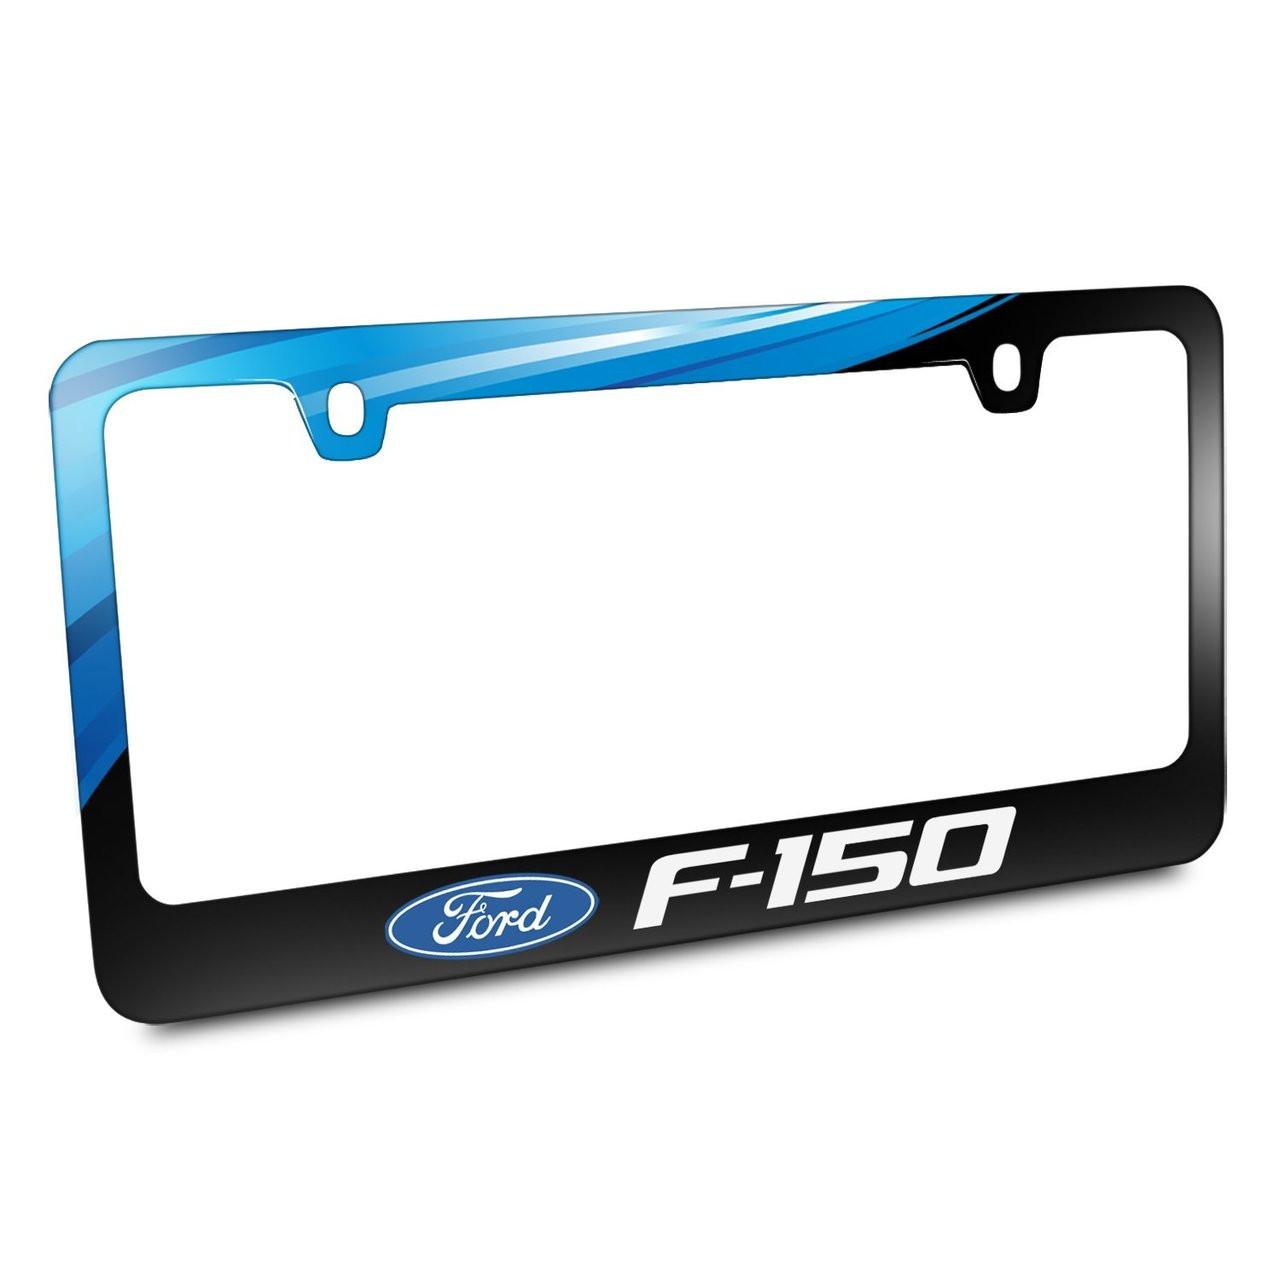 Ford Logo F-150 Black Metal Graphic License Plate Frame - Car Beyond ...